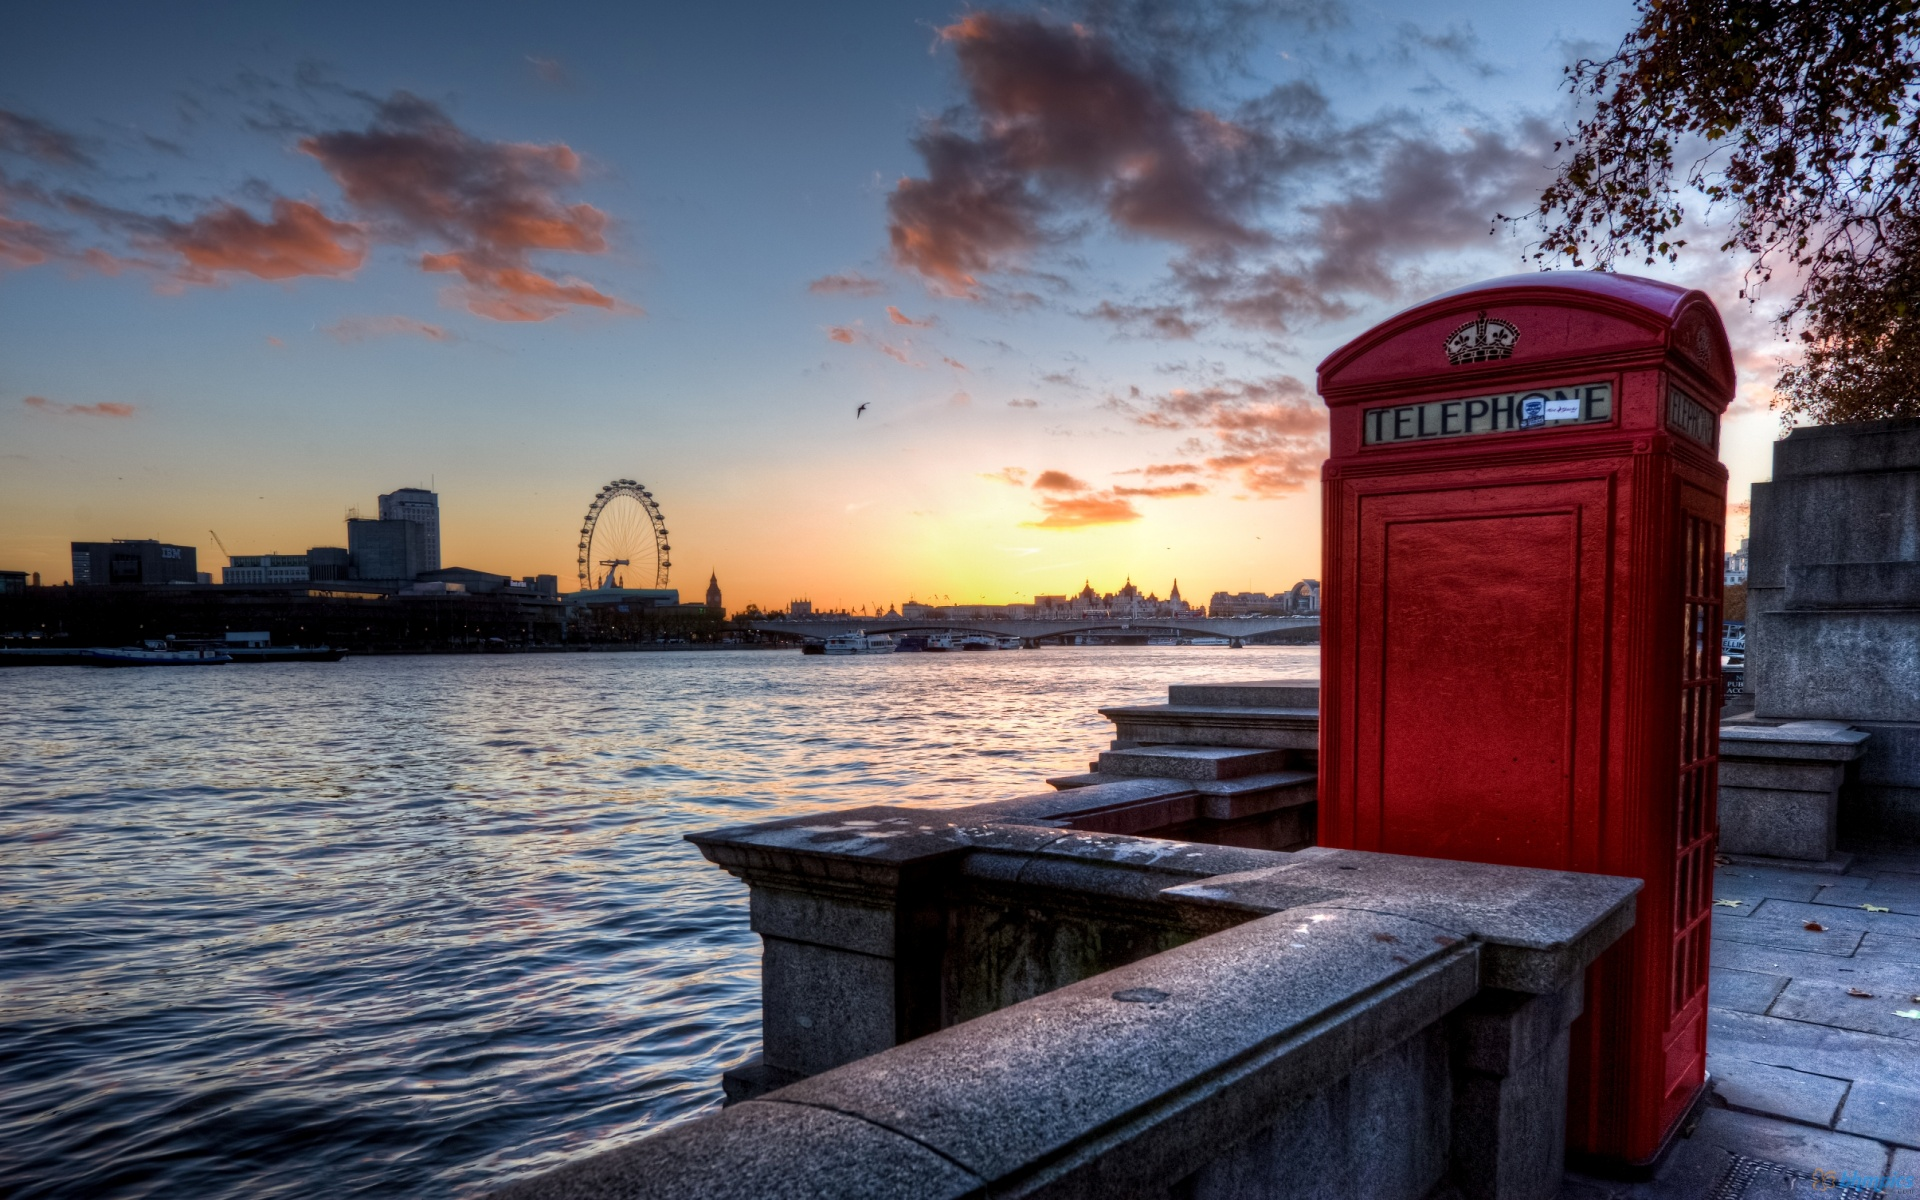 London Telephone Booth HD Wallpaper Desktop Picture